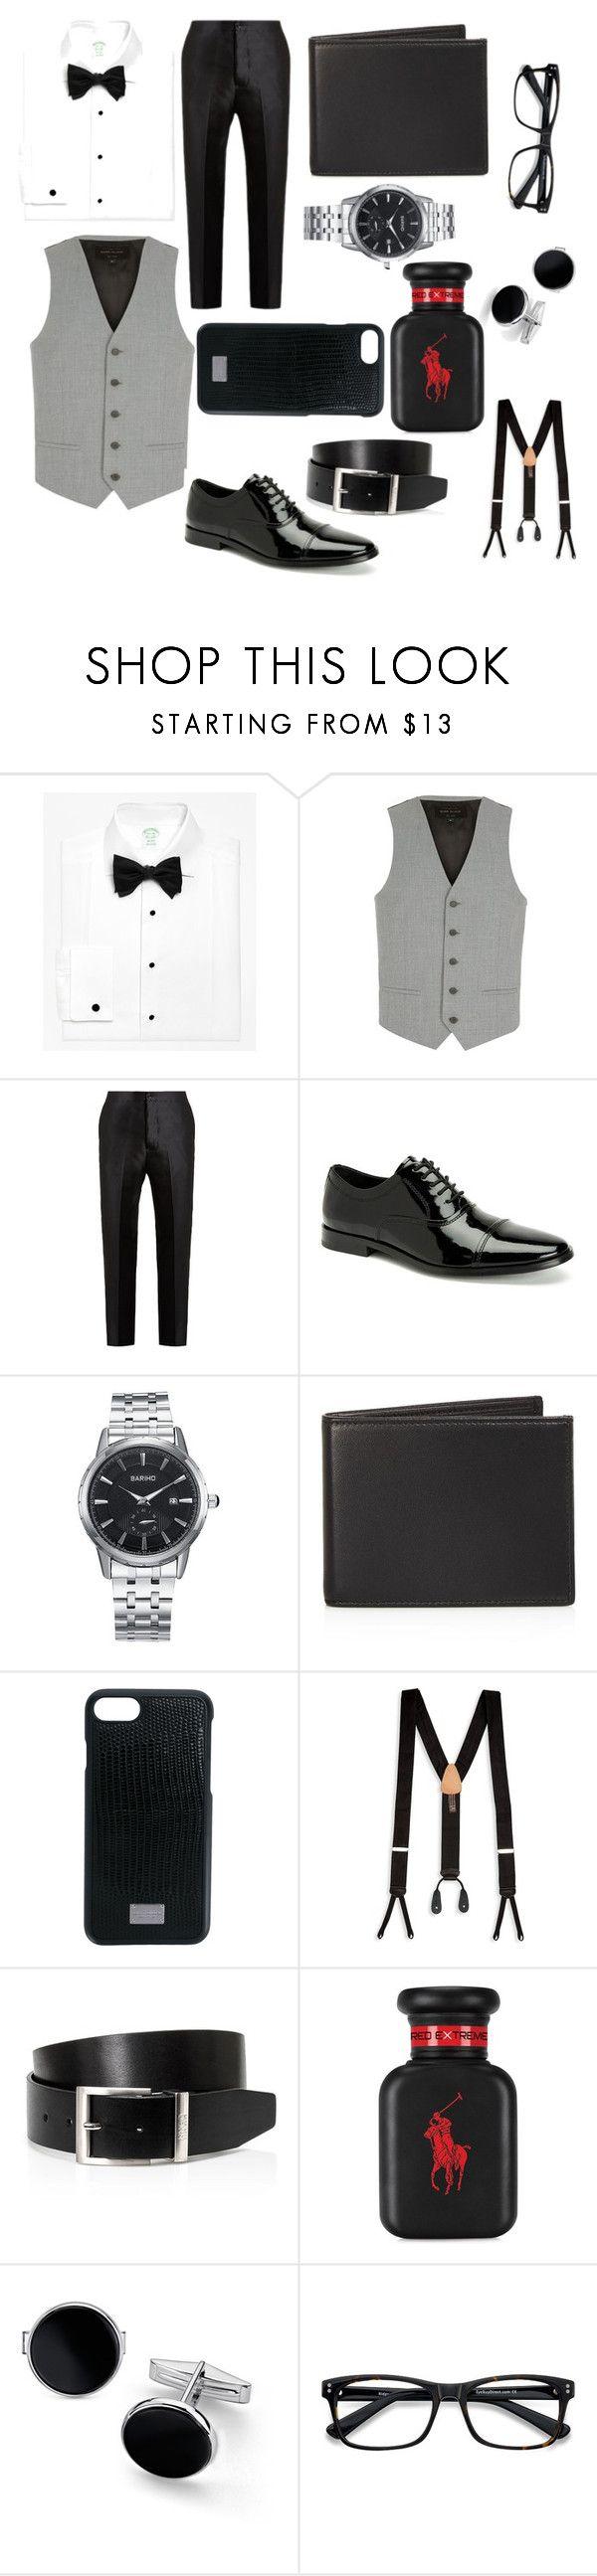 """Smart suit 👨🏫👨✈️👨🏼⚖️"" by caitlinthomson ❤ liked on Polyvore featuring Brooks Brothers, River Island, Bottega Veneta, Calvin Klein, The Men's Store, Dolce&Gabbana, Trafalgar, HUGO, Ralph Lauren and Blue Nile"